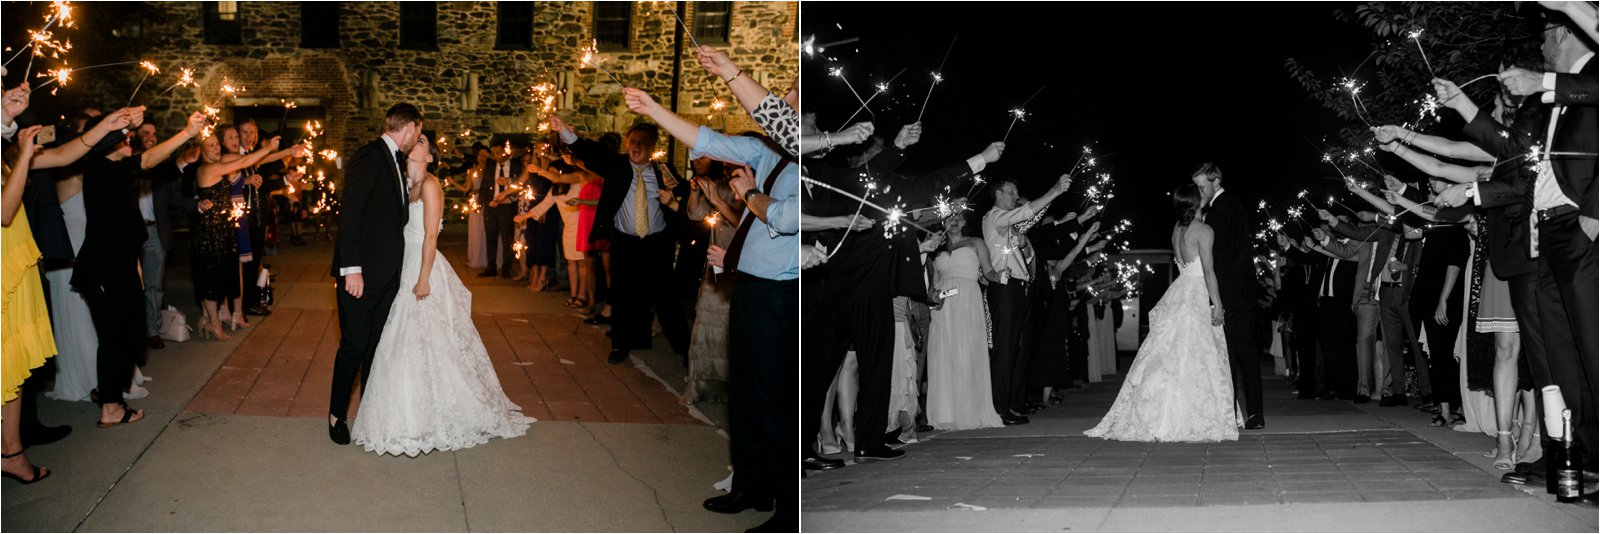 Baltimore Wedding Photographer_135.jpg